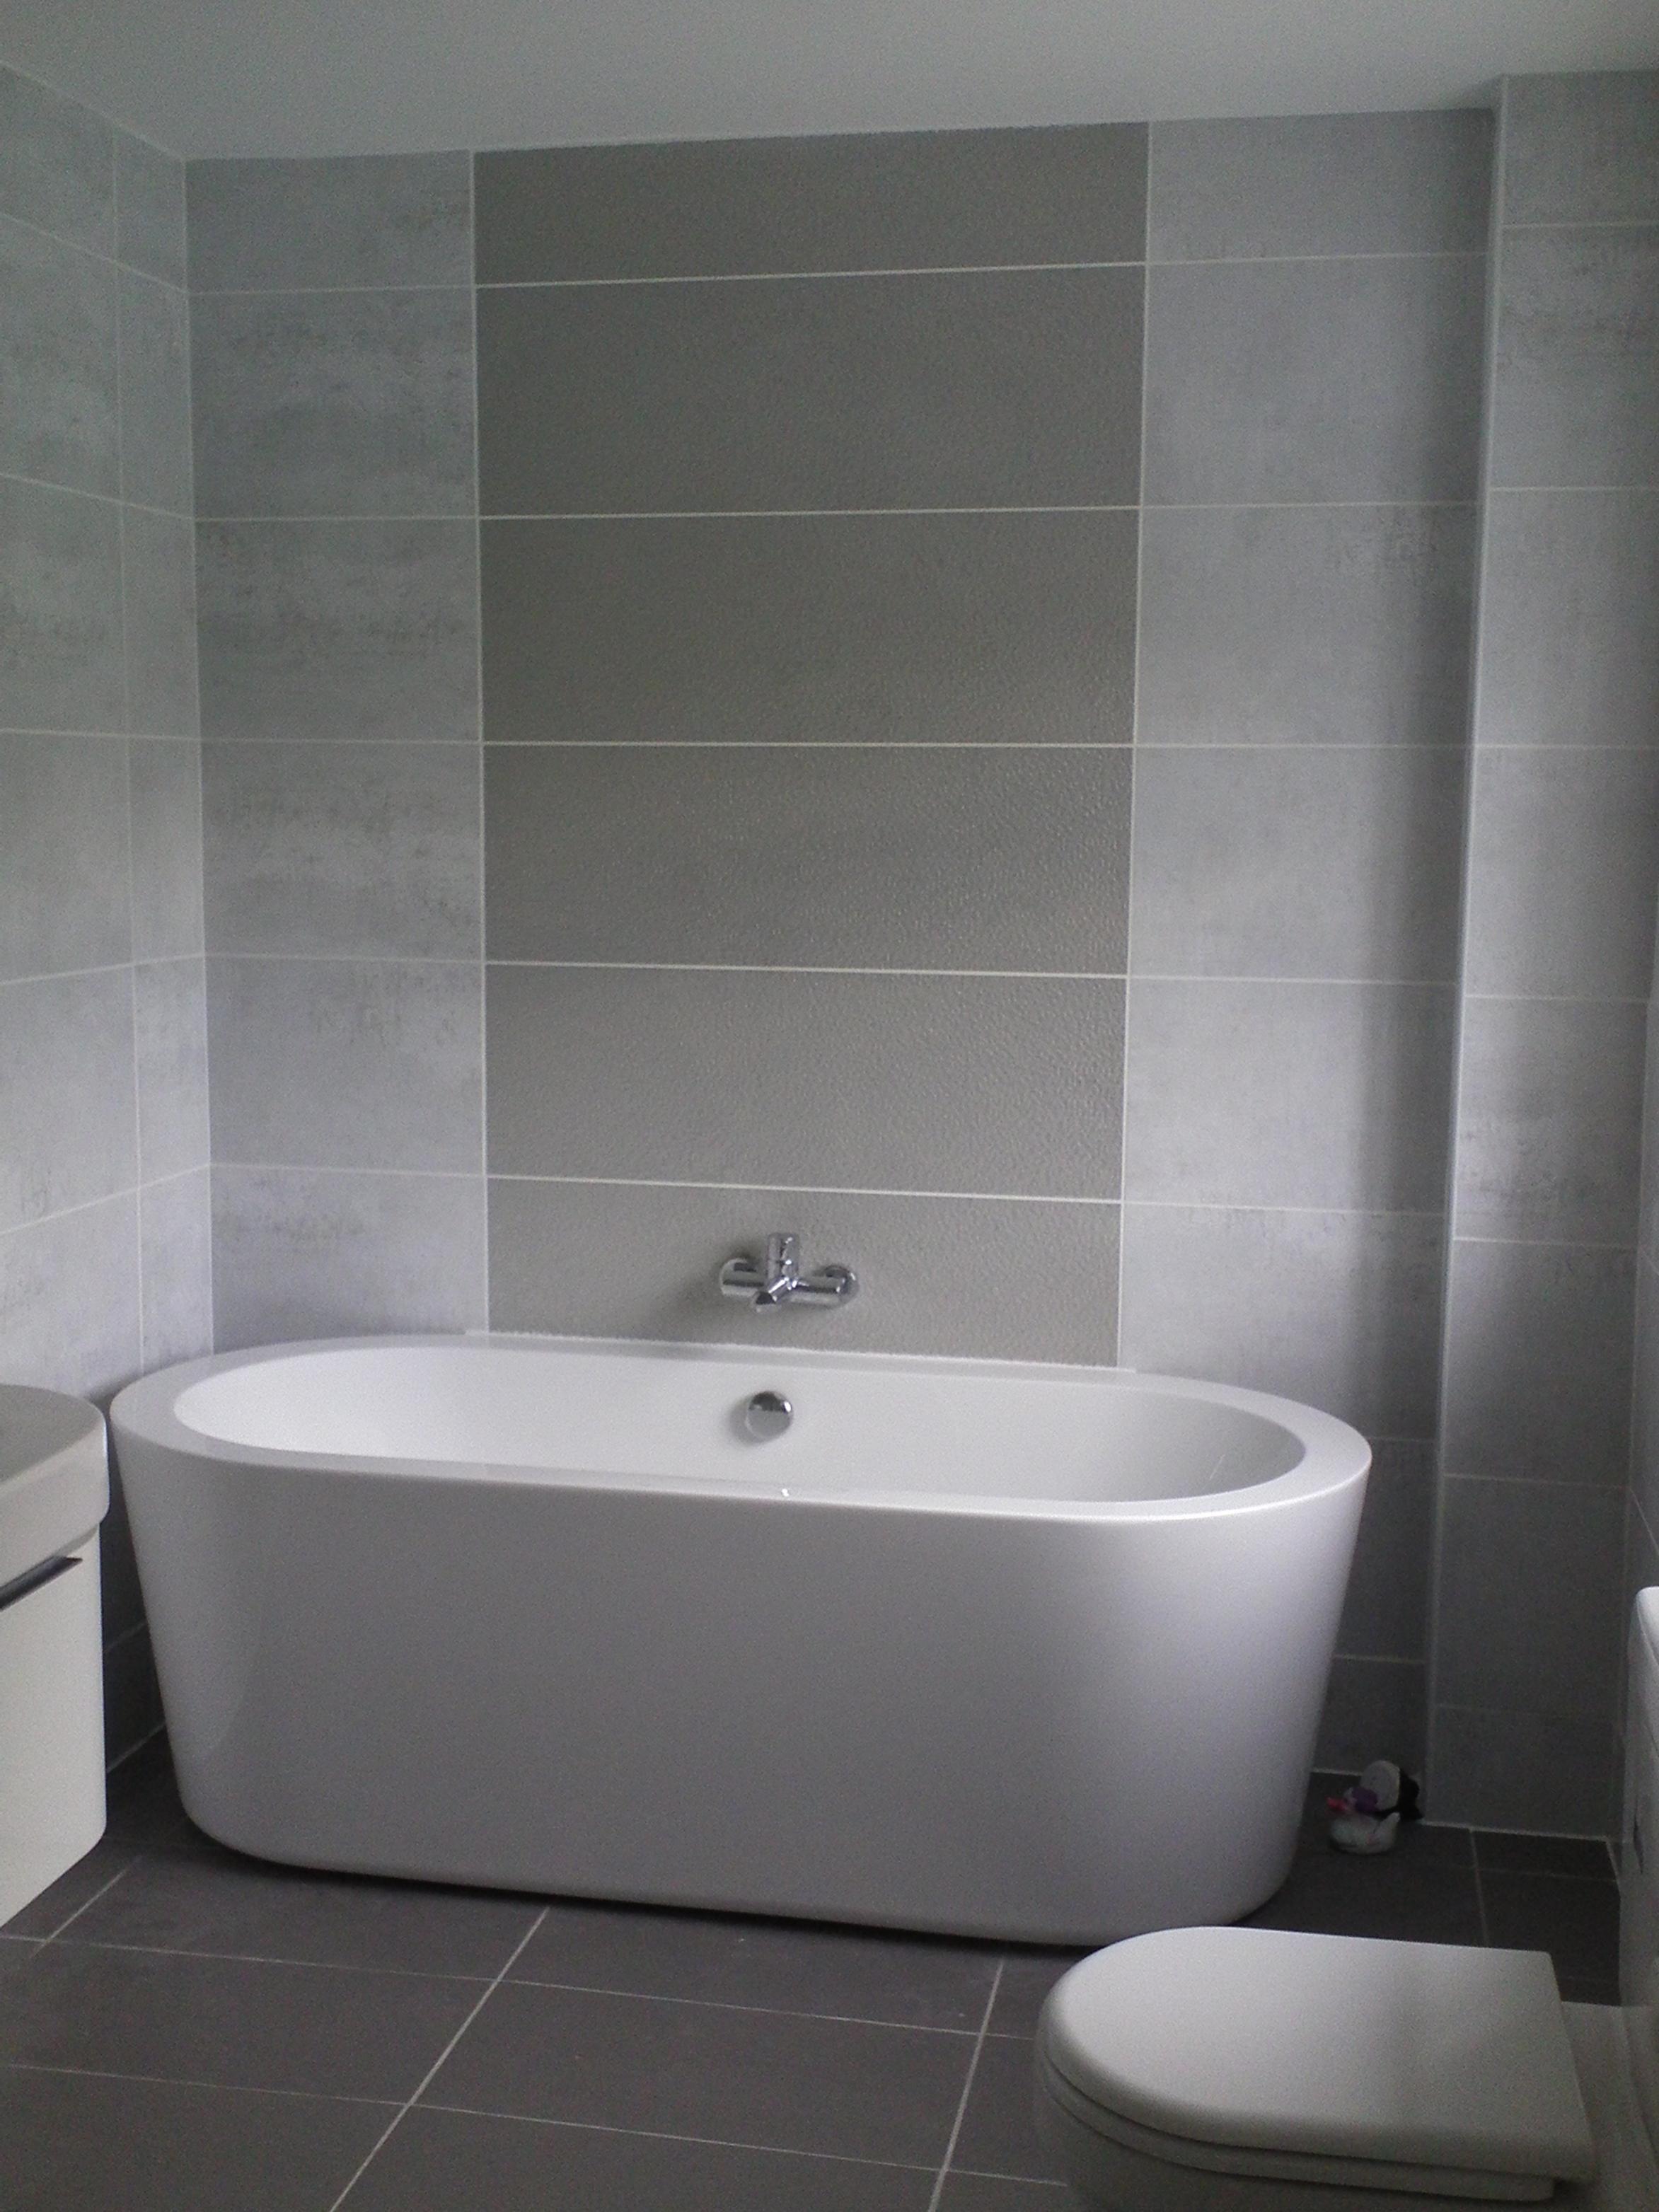 34 Luxury Ceramic Tiles Bathroom Decortez Gray Bathroom Accessories Best Bathroom Designs White Bathroom Accessories